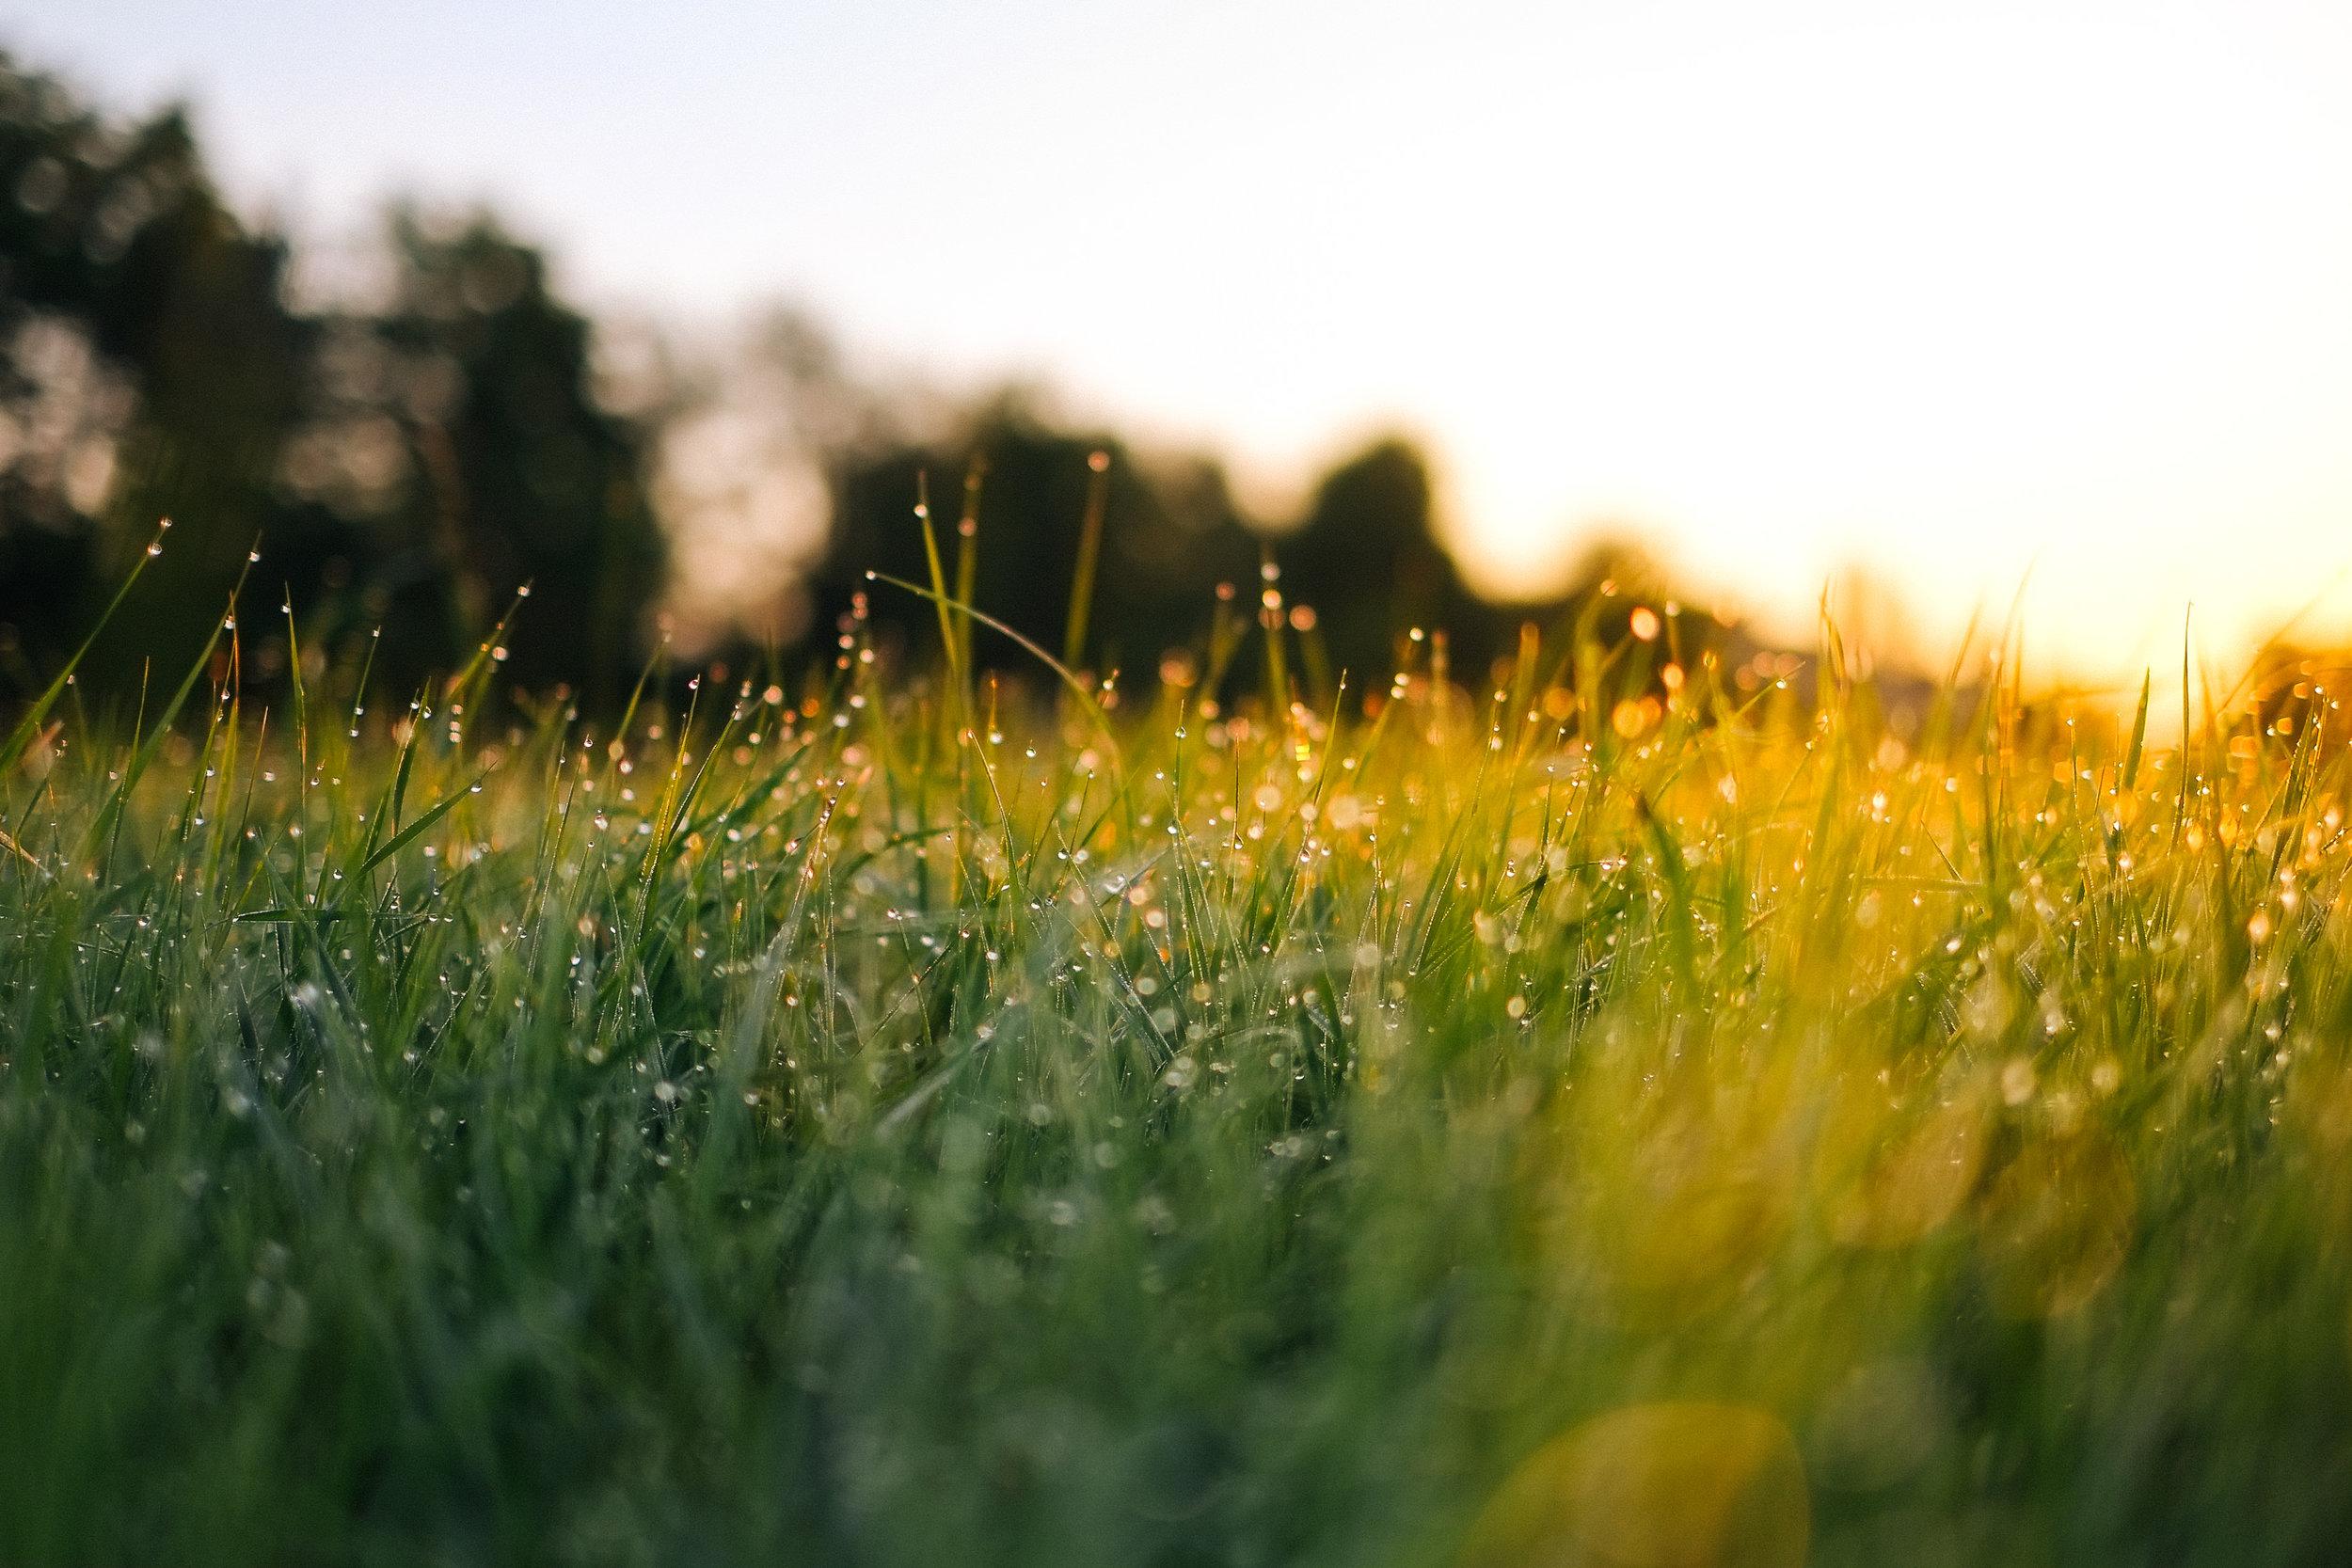 dew-on-grass.jpeg